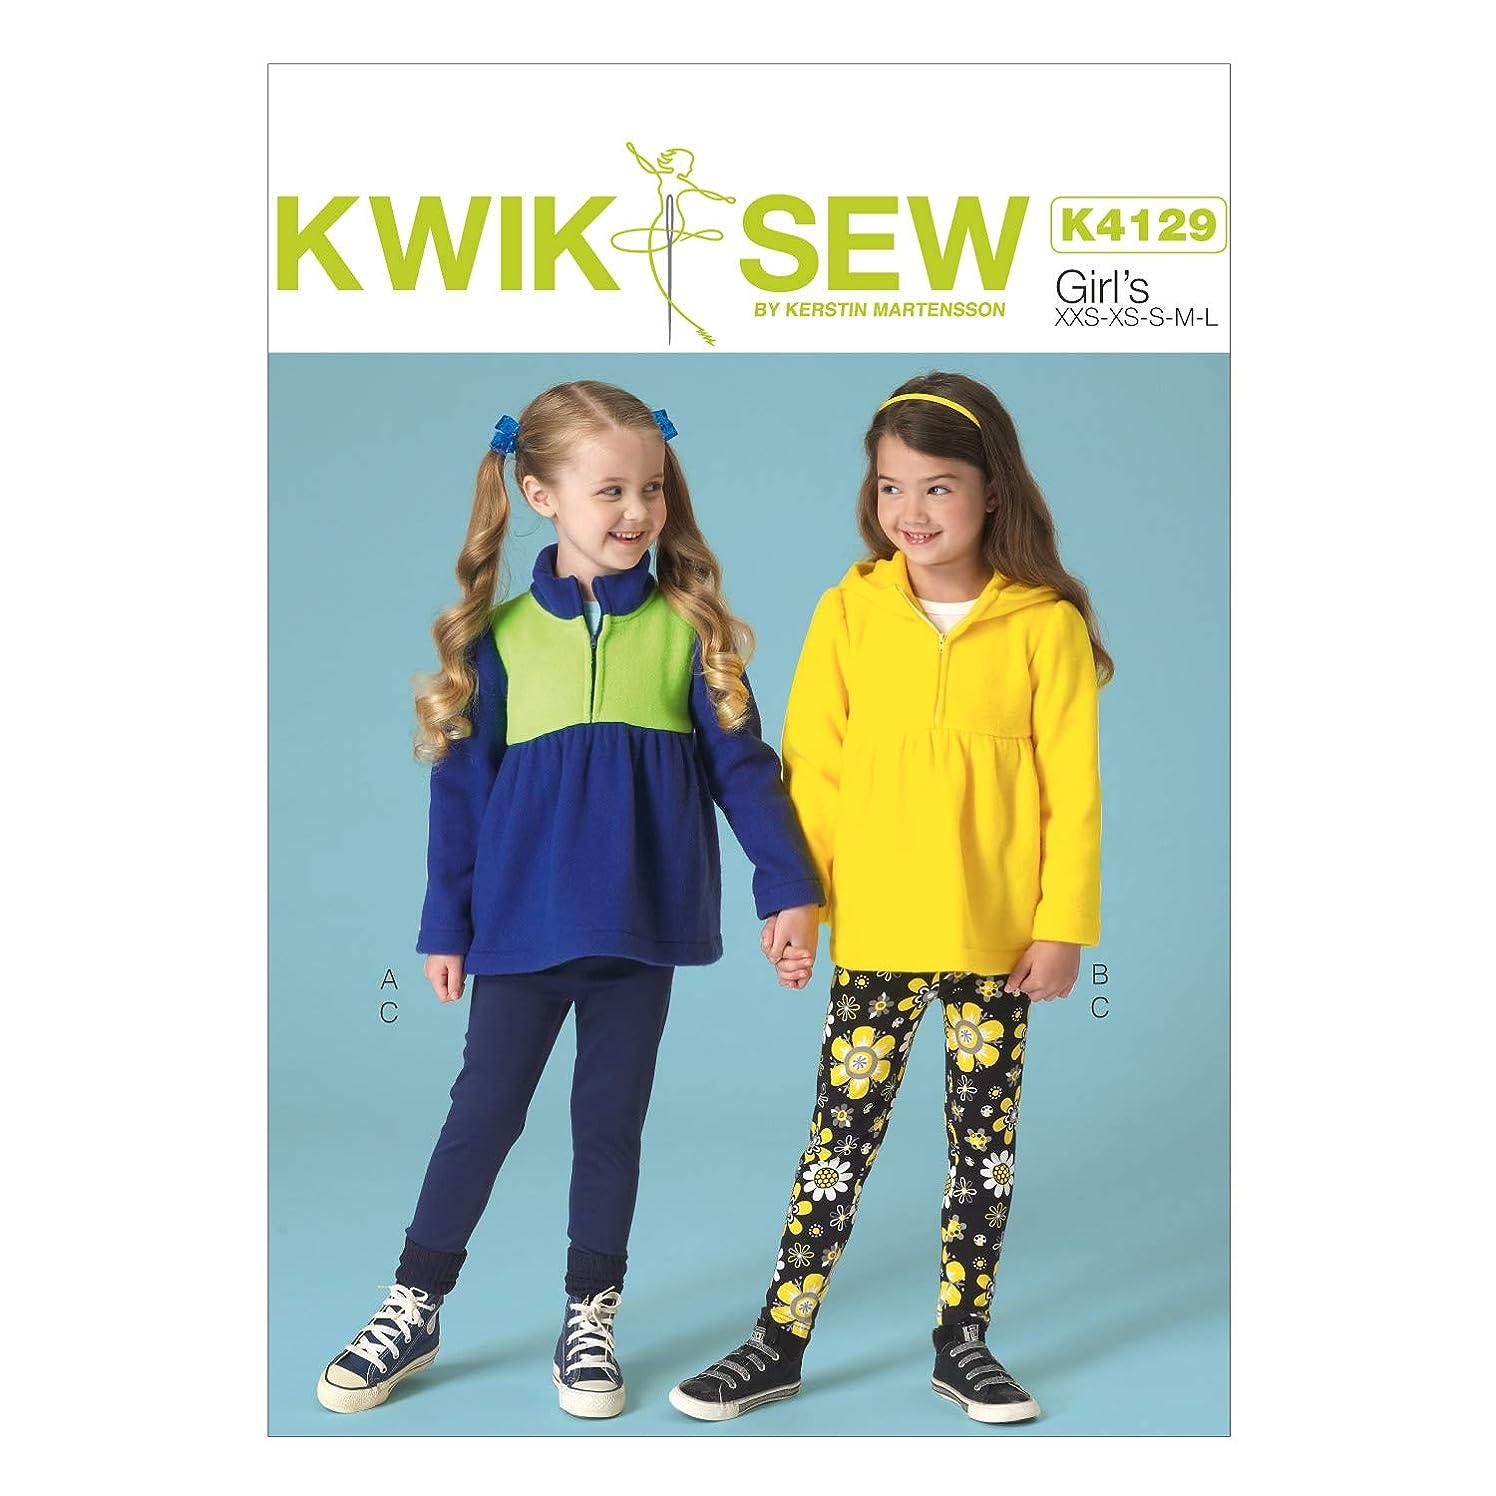 KWIK-SEW PATTERNS K4129 Girls' Tops & Leggings, All Sizes (XX-Small-Large)